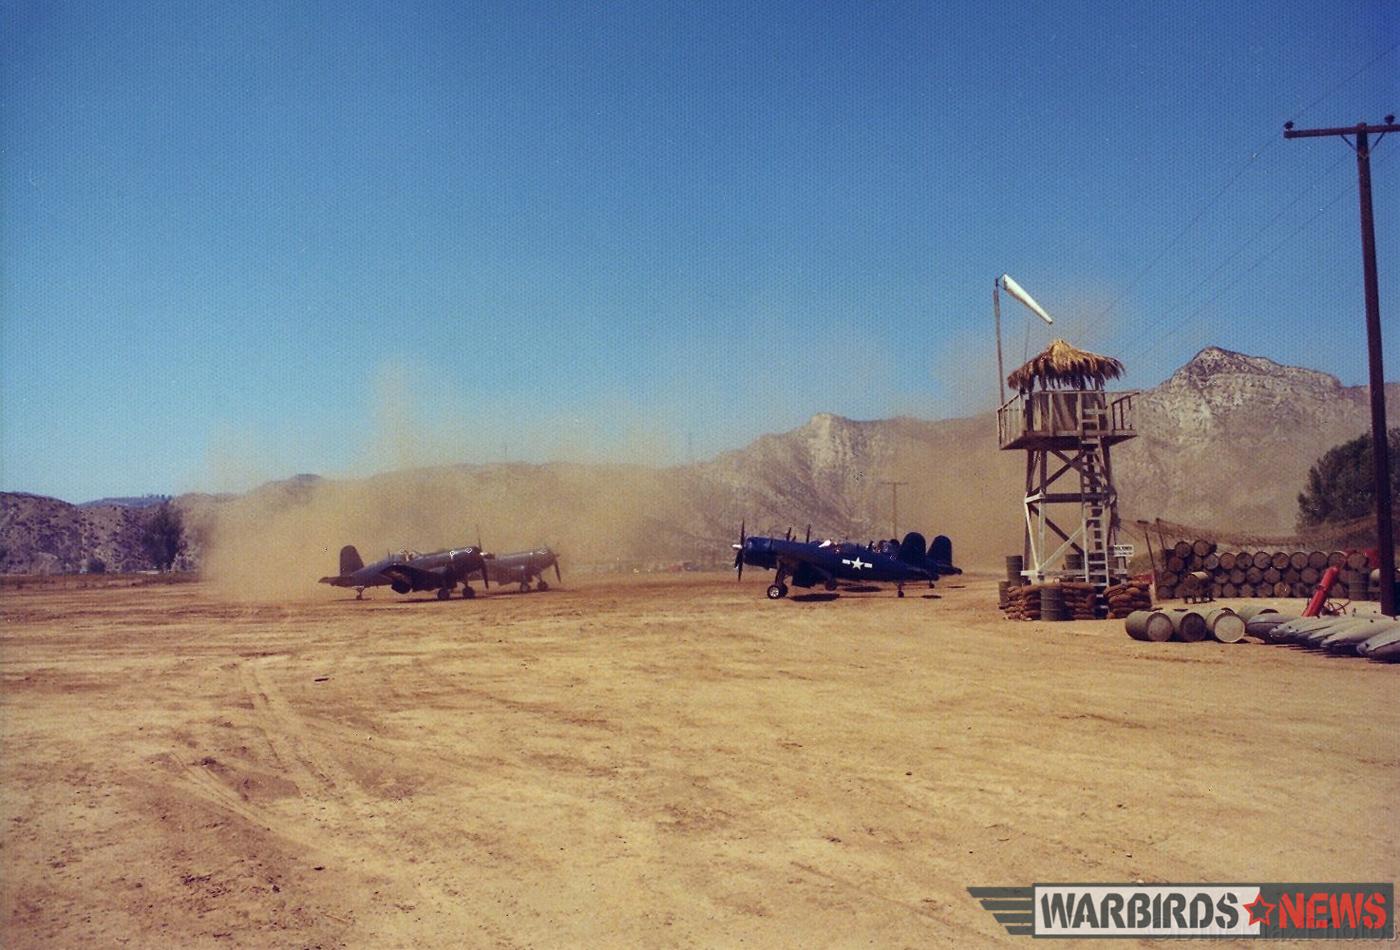 Corsairs and dust. (photo via Stephen Chapis)